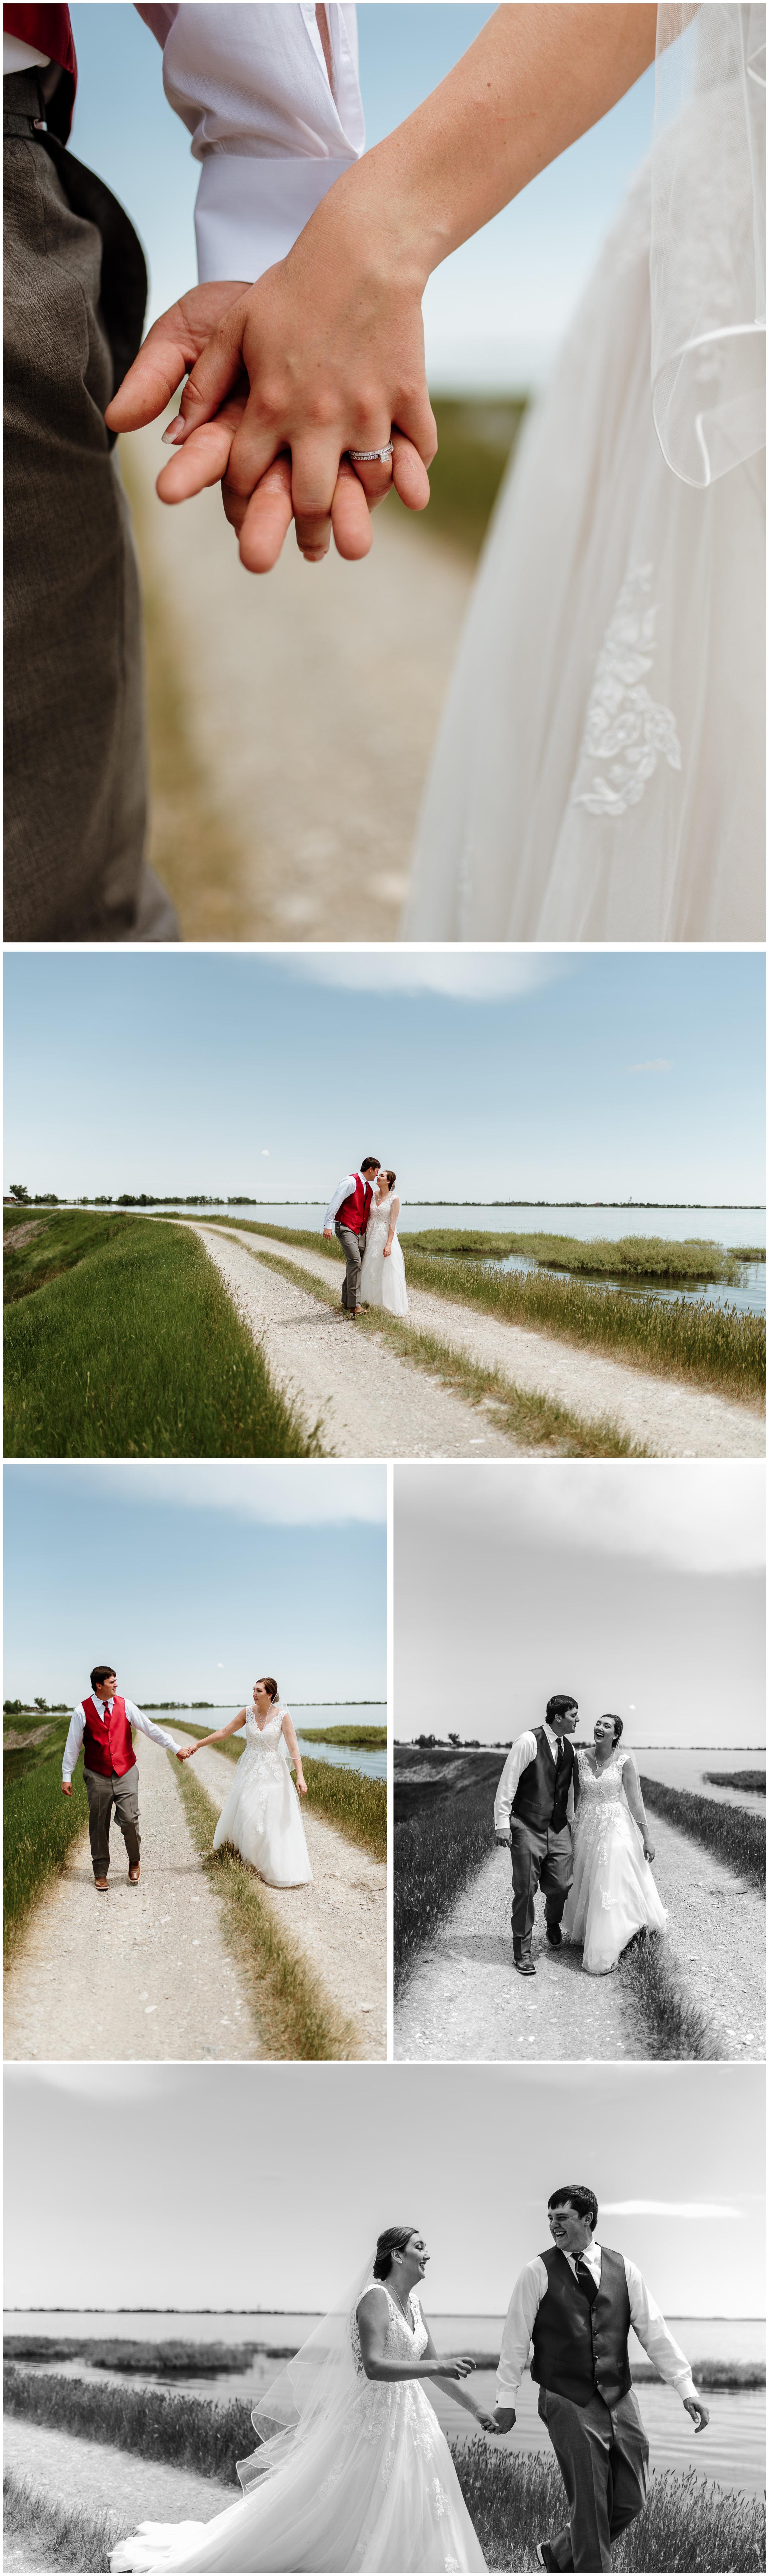 malia_clint_valier_rural_wedding_p21.jpg